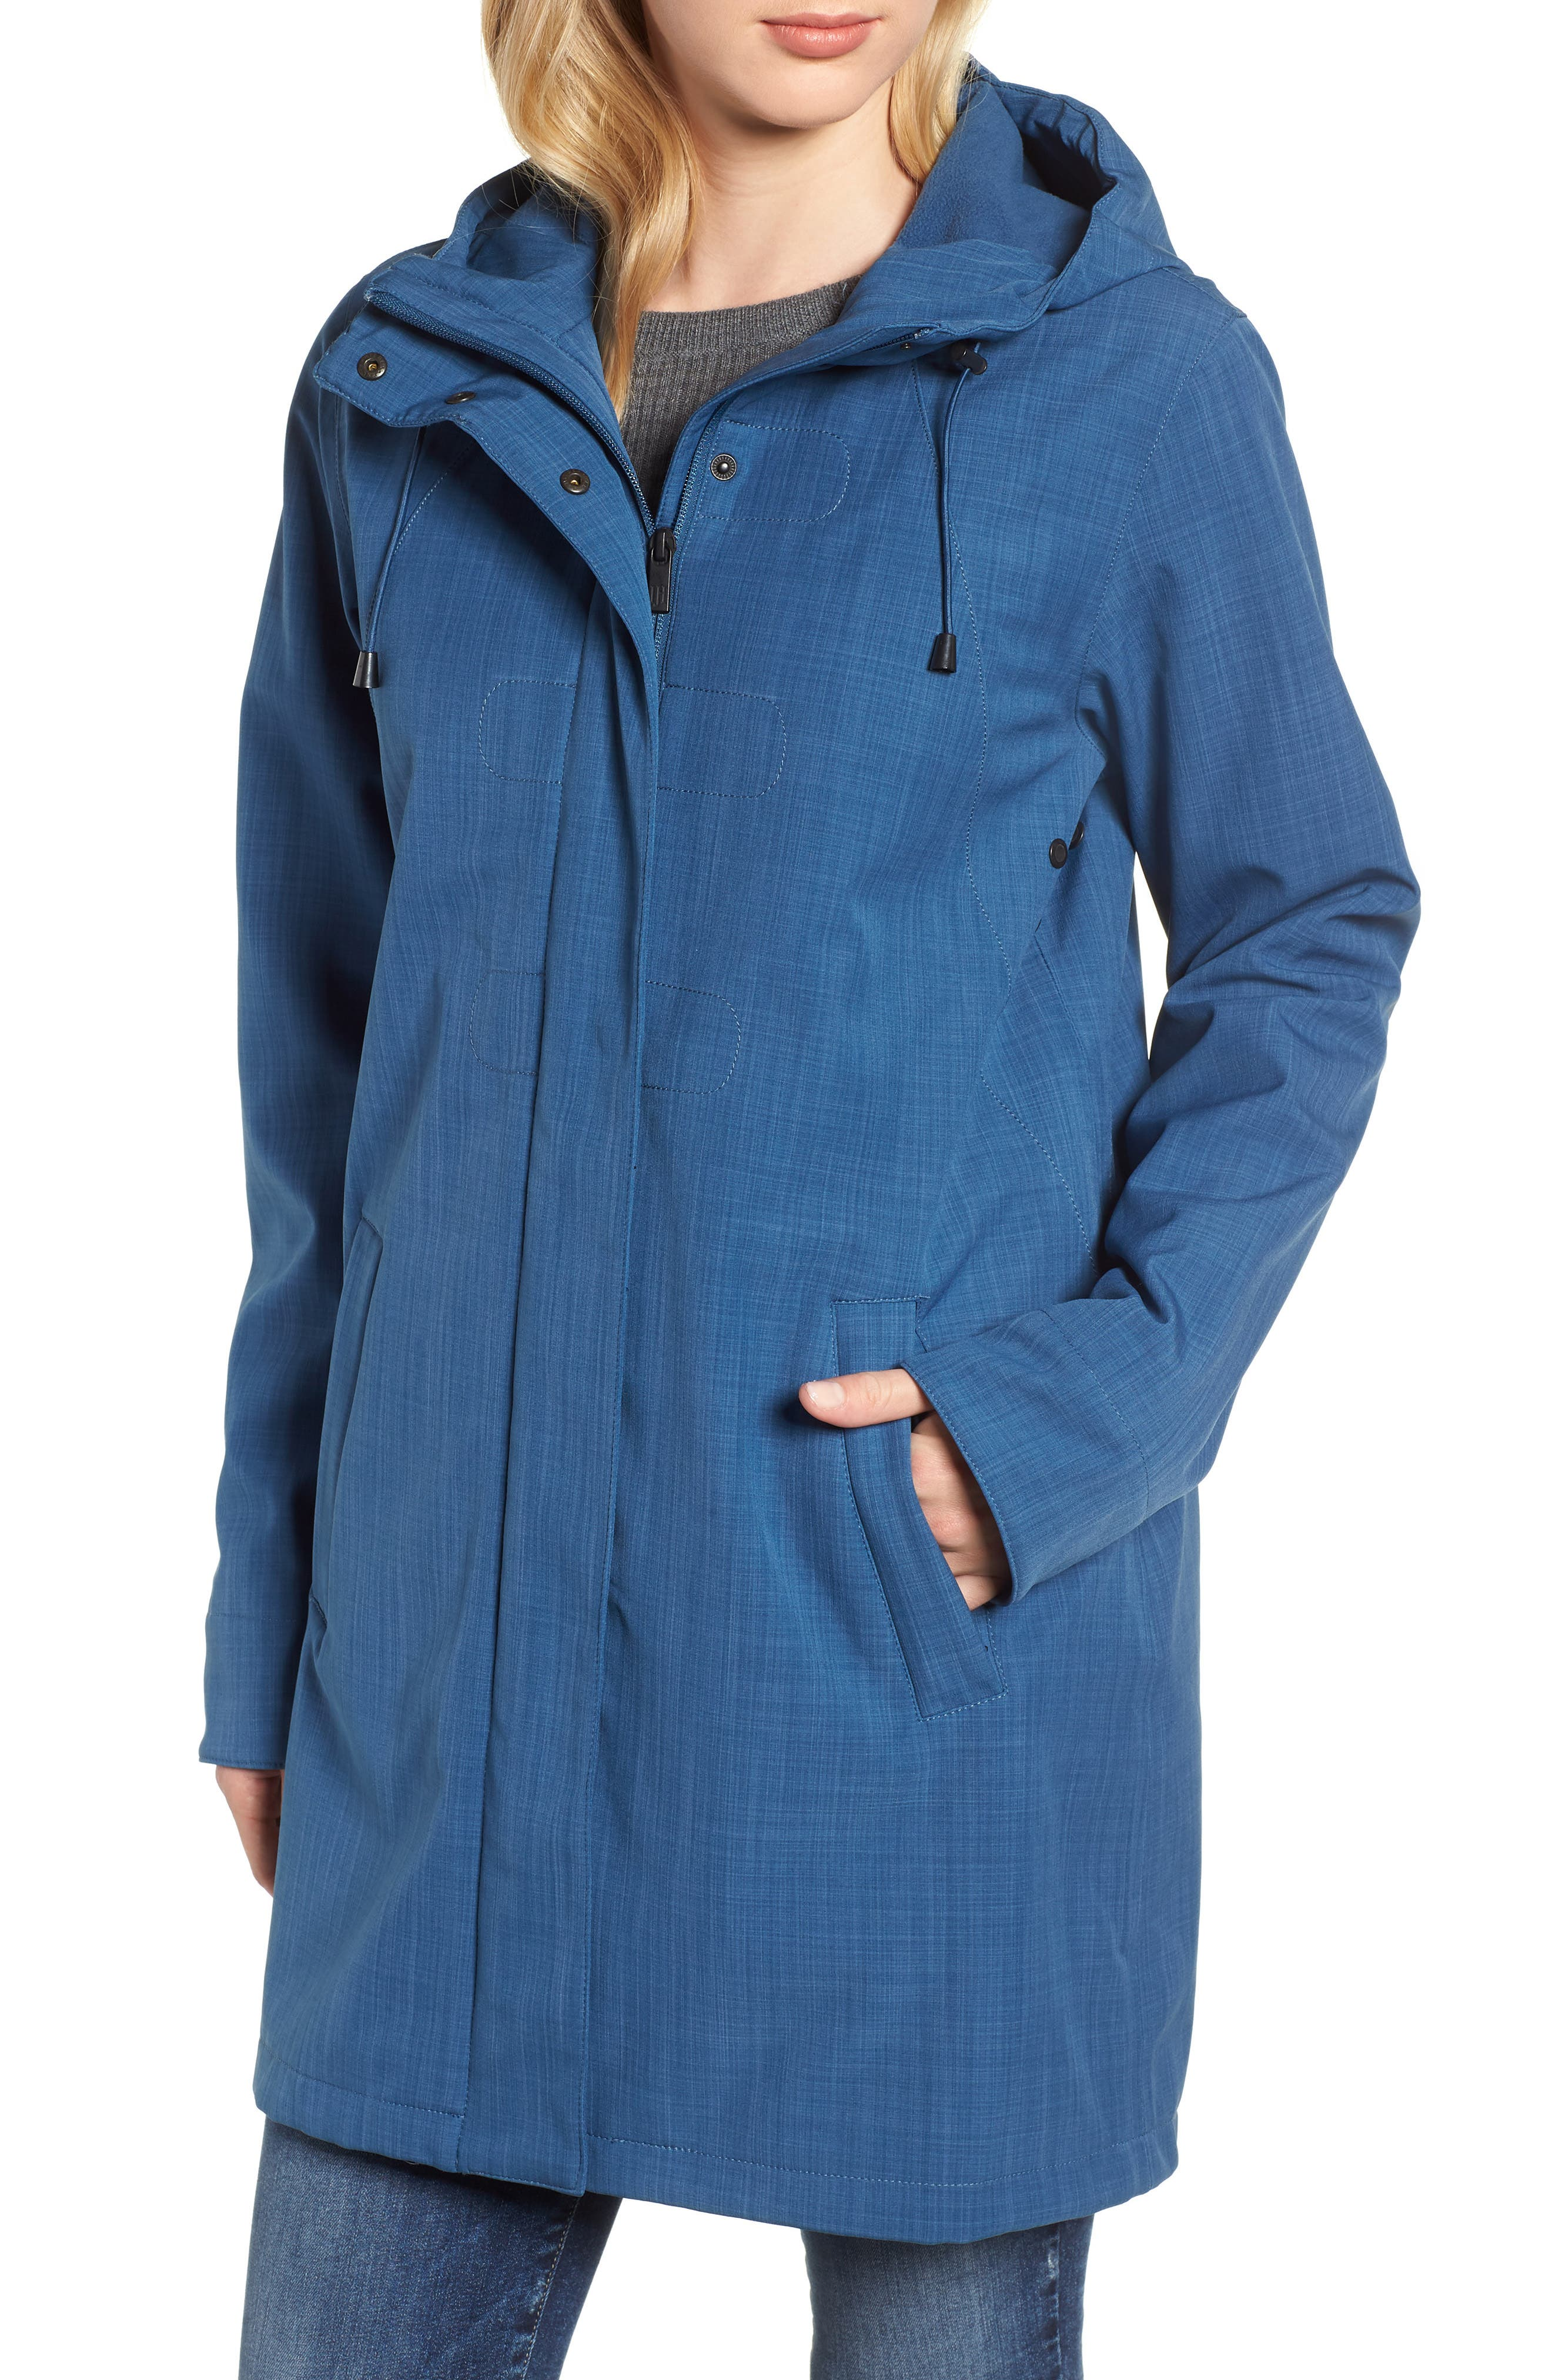 Hooded Raincoat,                             Alternate thumbnail 4, color,                             400